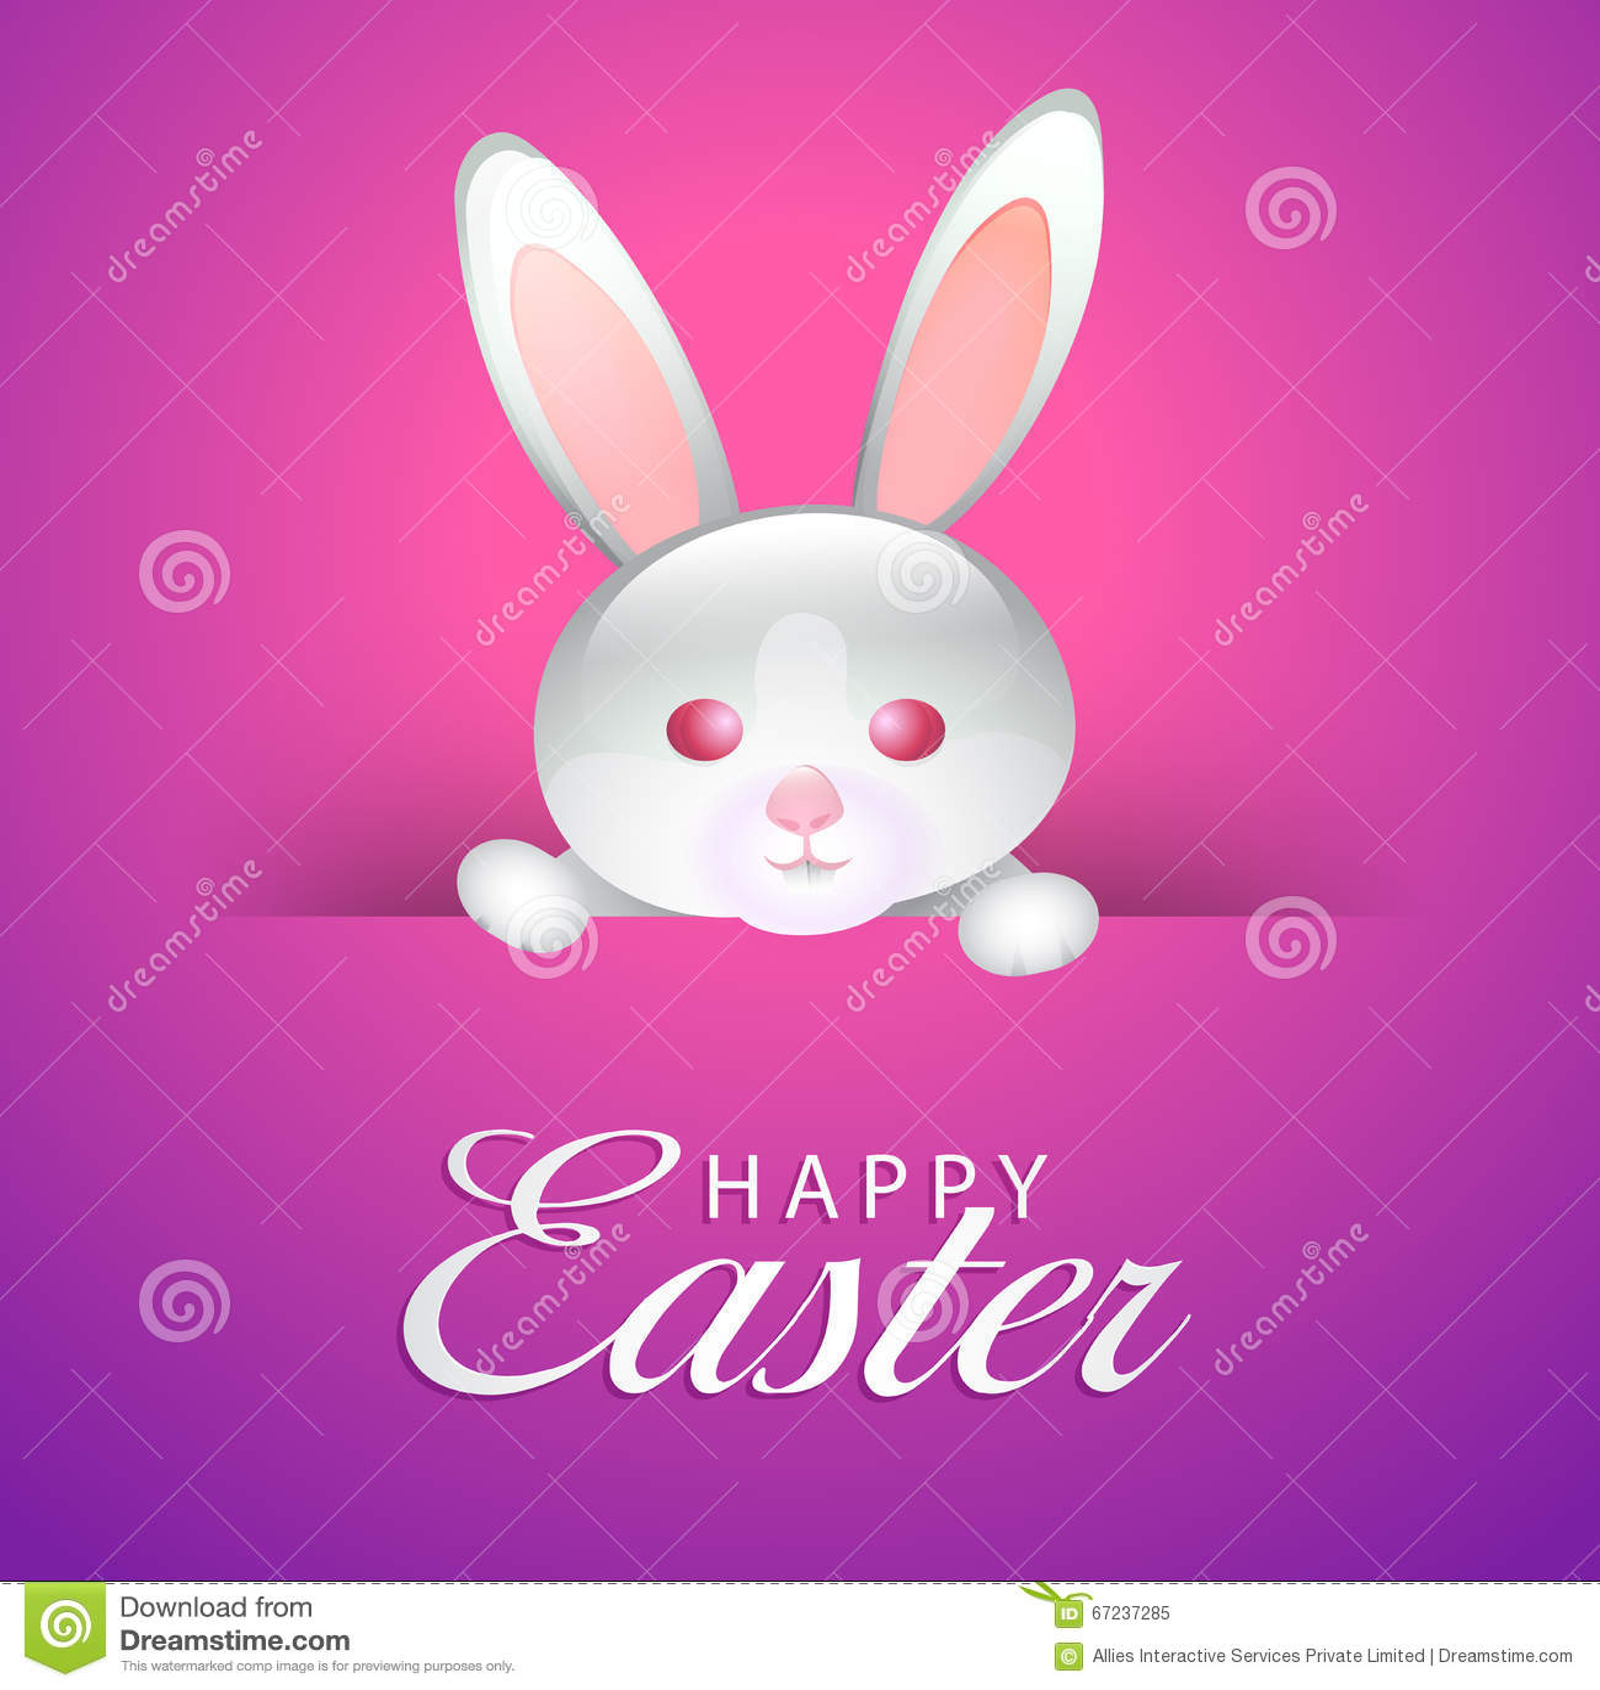 Greeting Card For Happy Easter Celebration Stock Illustration